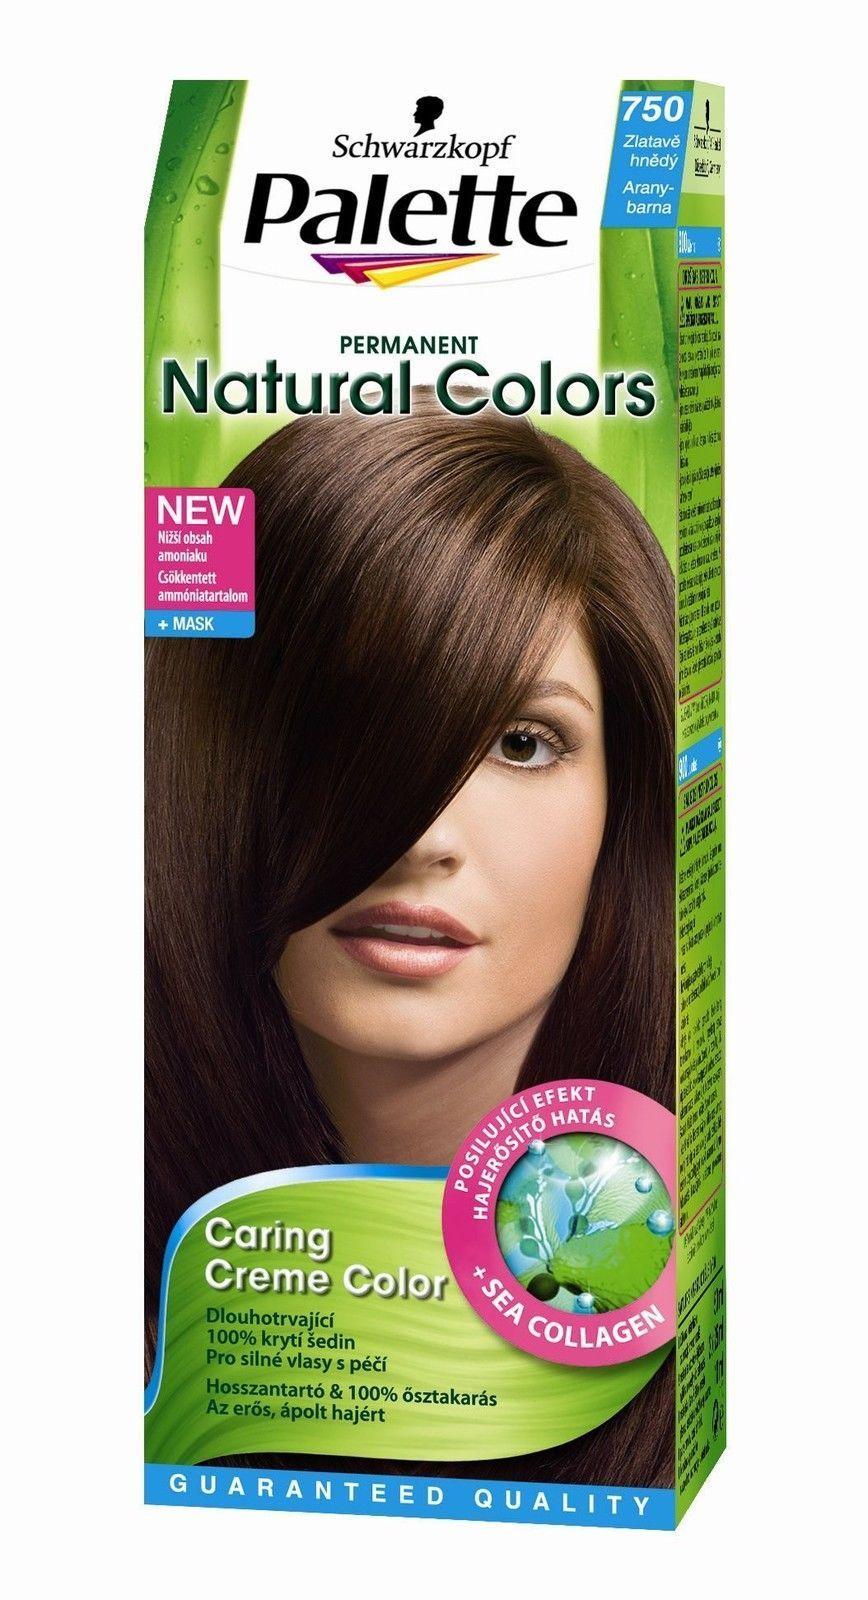 Details About Schwartzkopf Palette Natural Colors750 Golden Brown